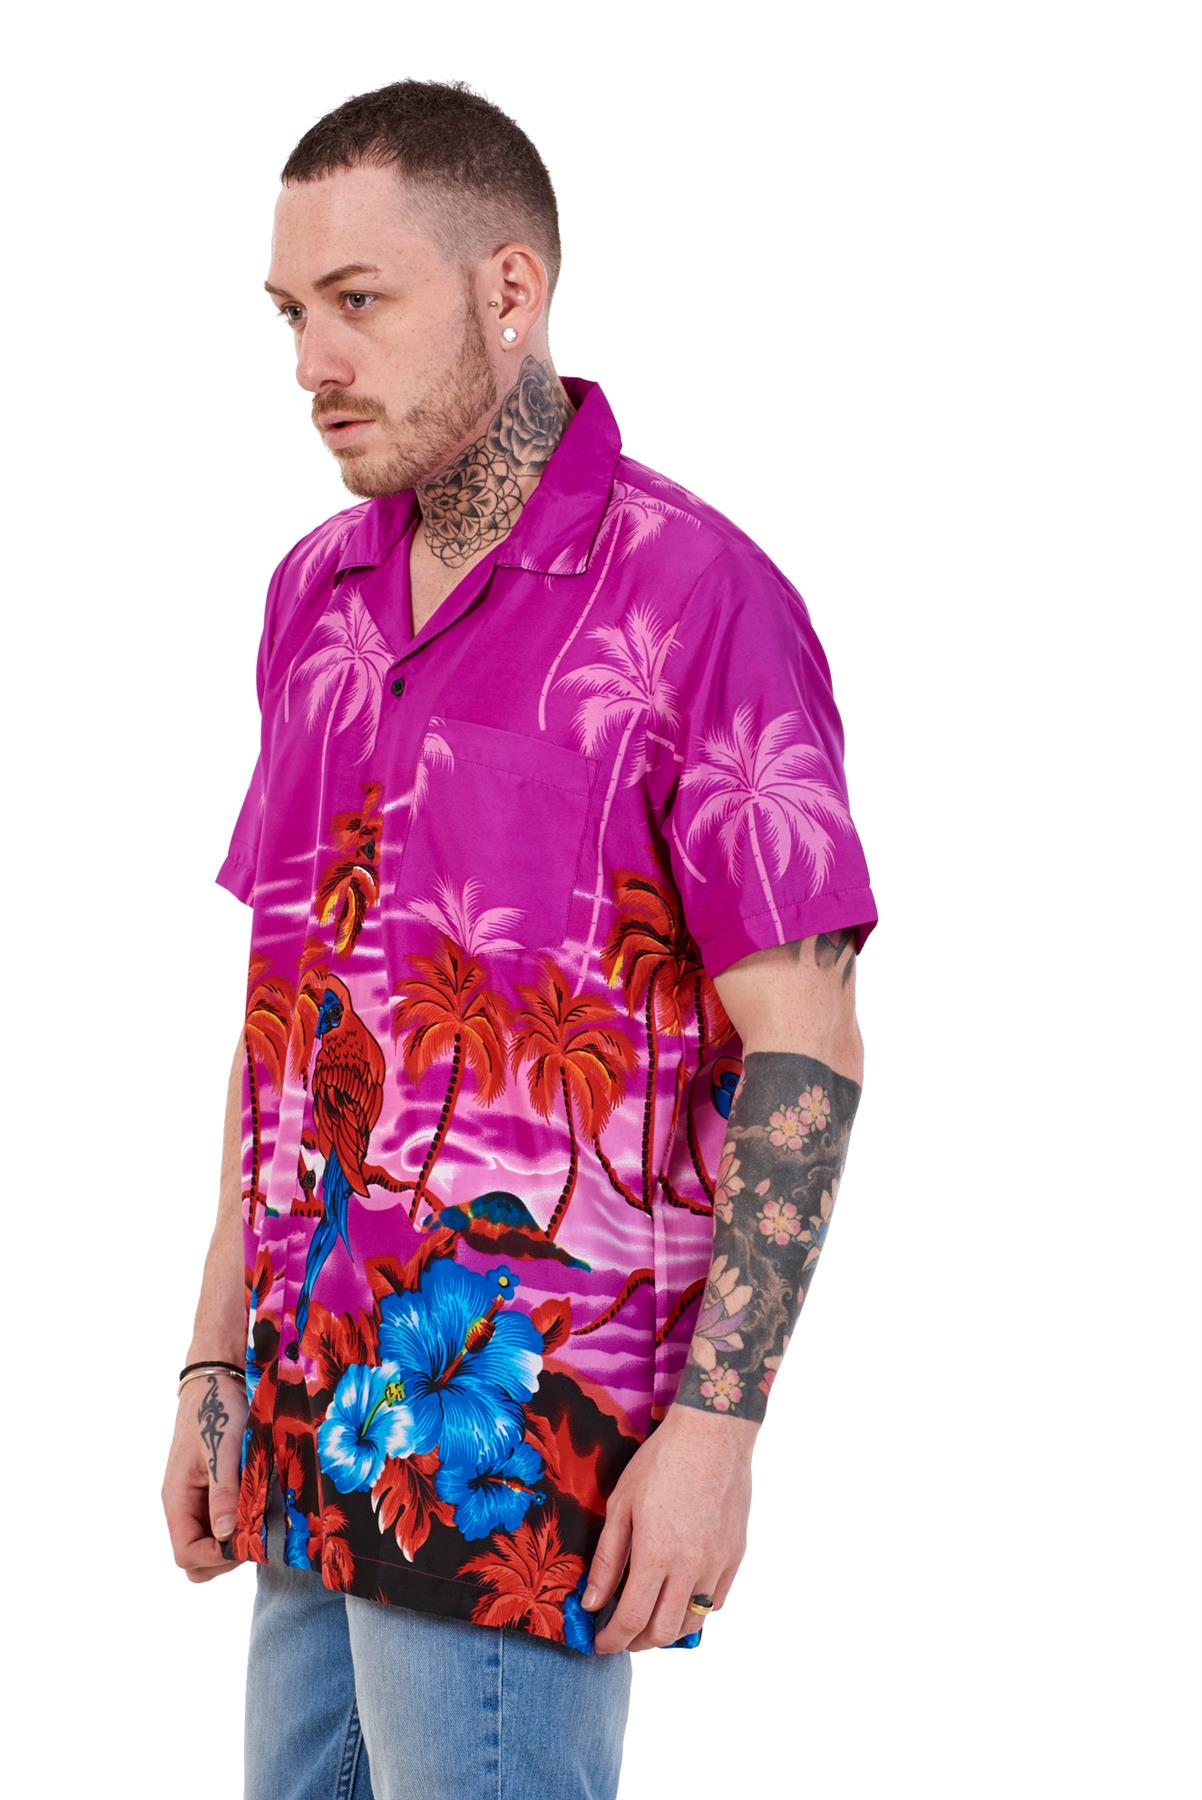 Mens-Hawaiian-Shirt-Multi-Colors-Print-Regular-Big-Size-Summer-Fancy-Dress-M-5XL thumbnail 31